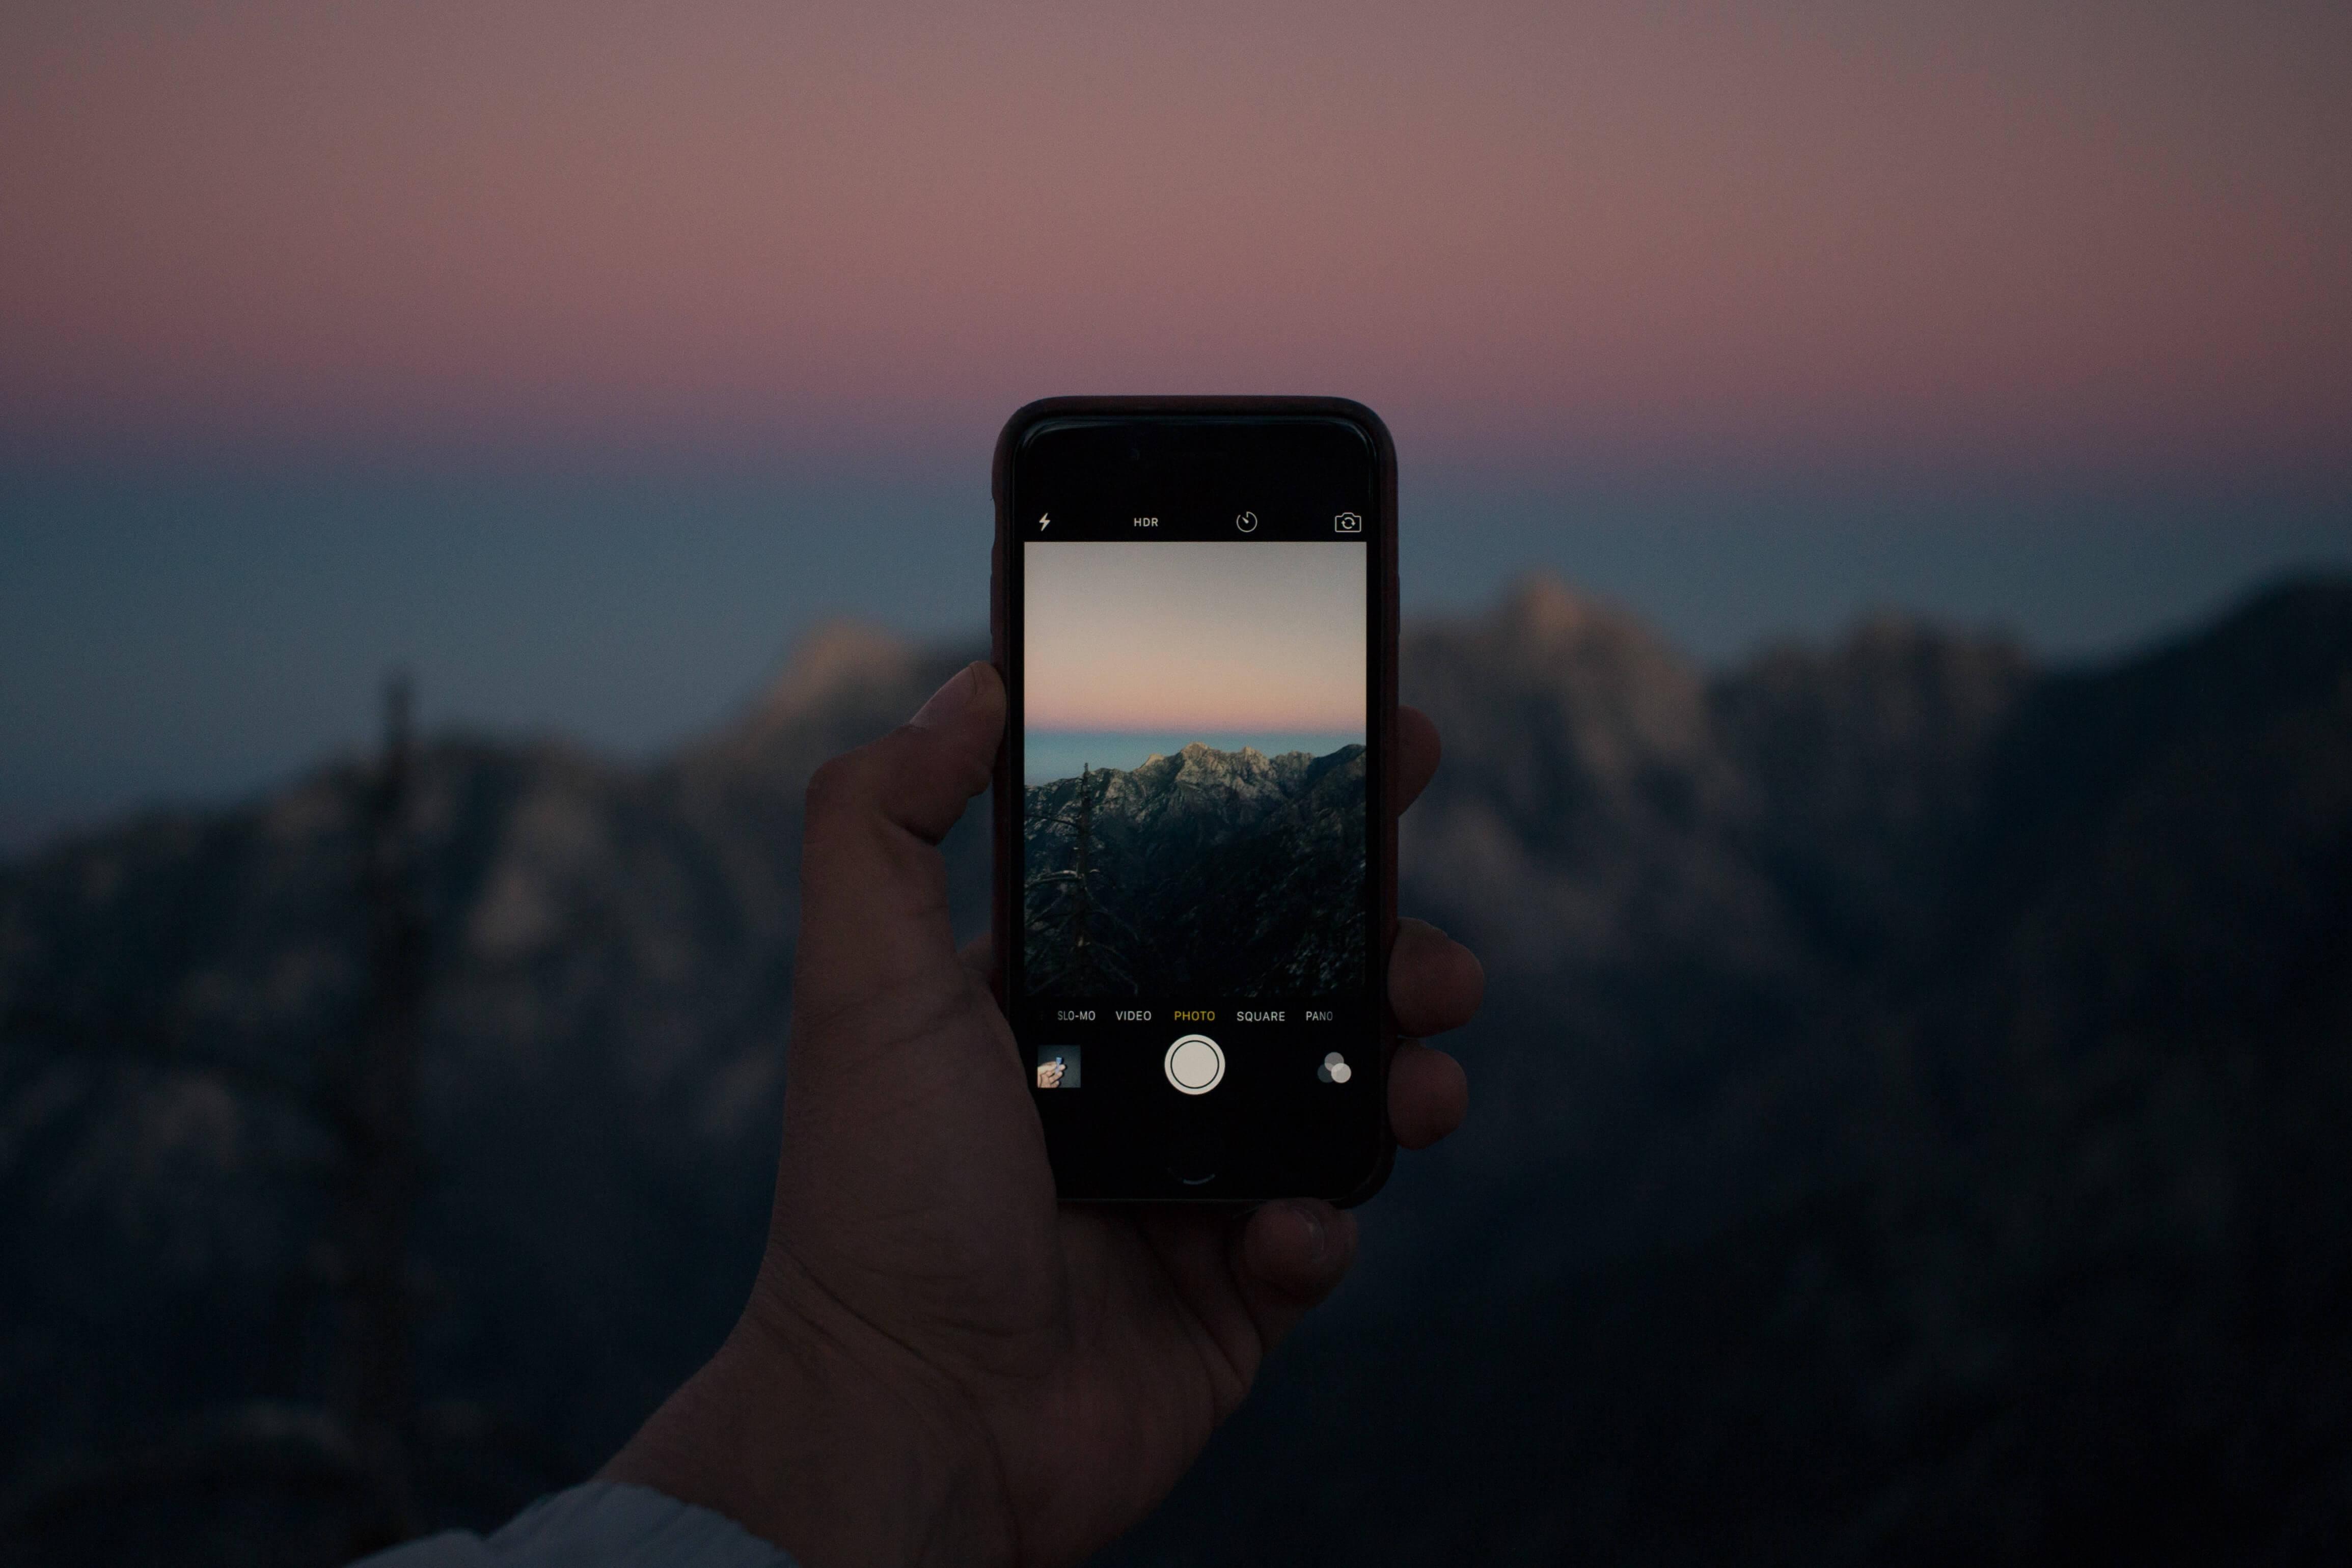 Želite da vam Instagram izgleda bolje? Evo kako do savršene fotke bez skupe opreme